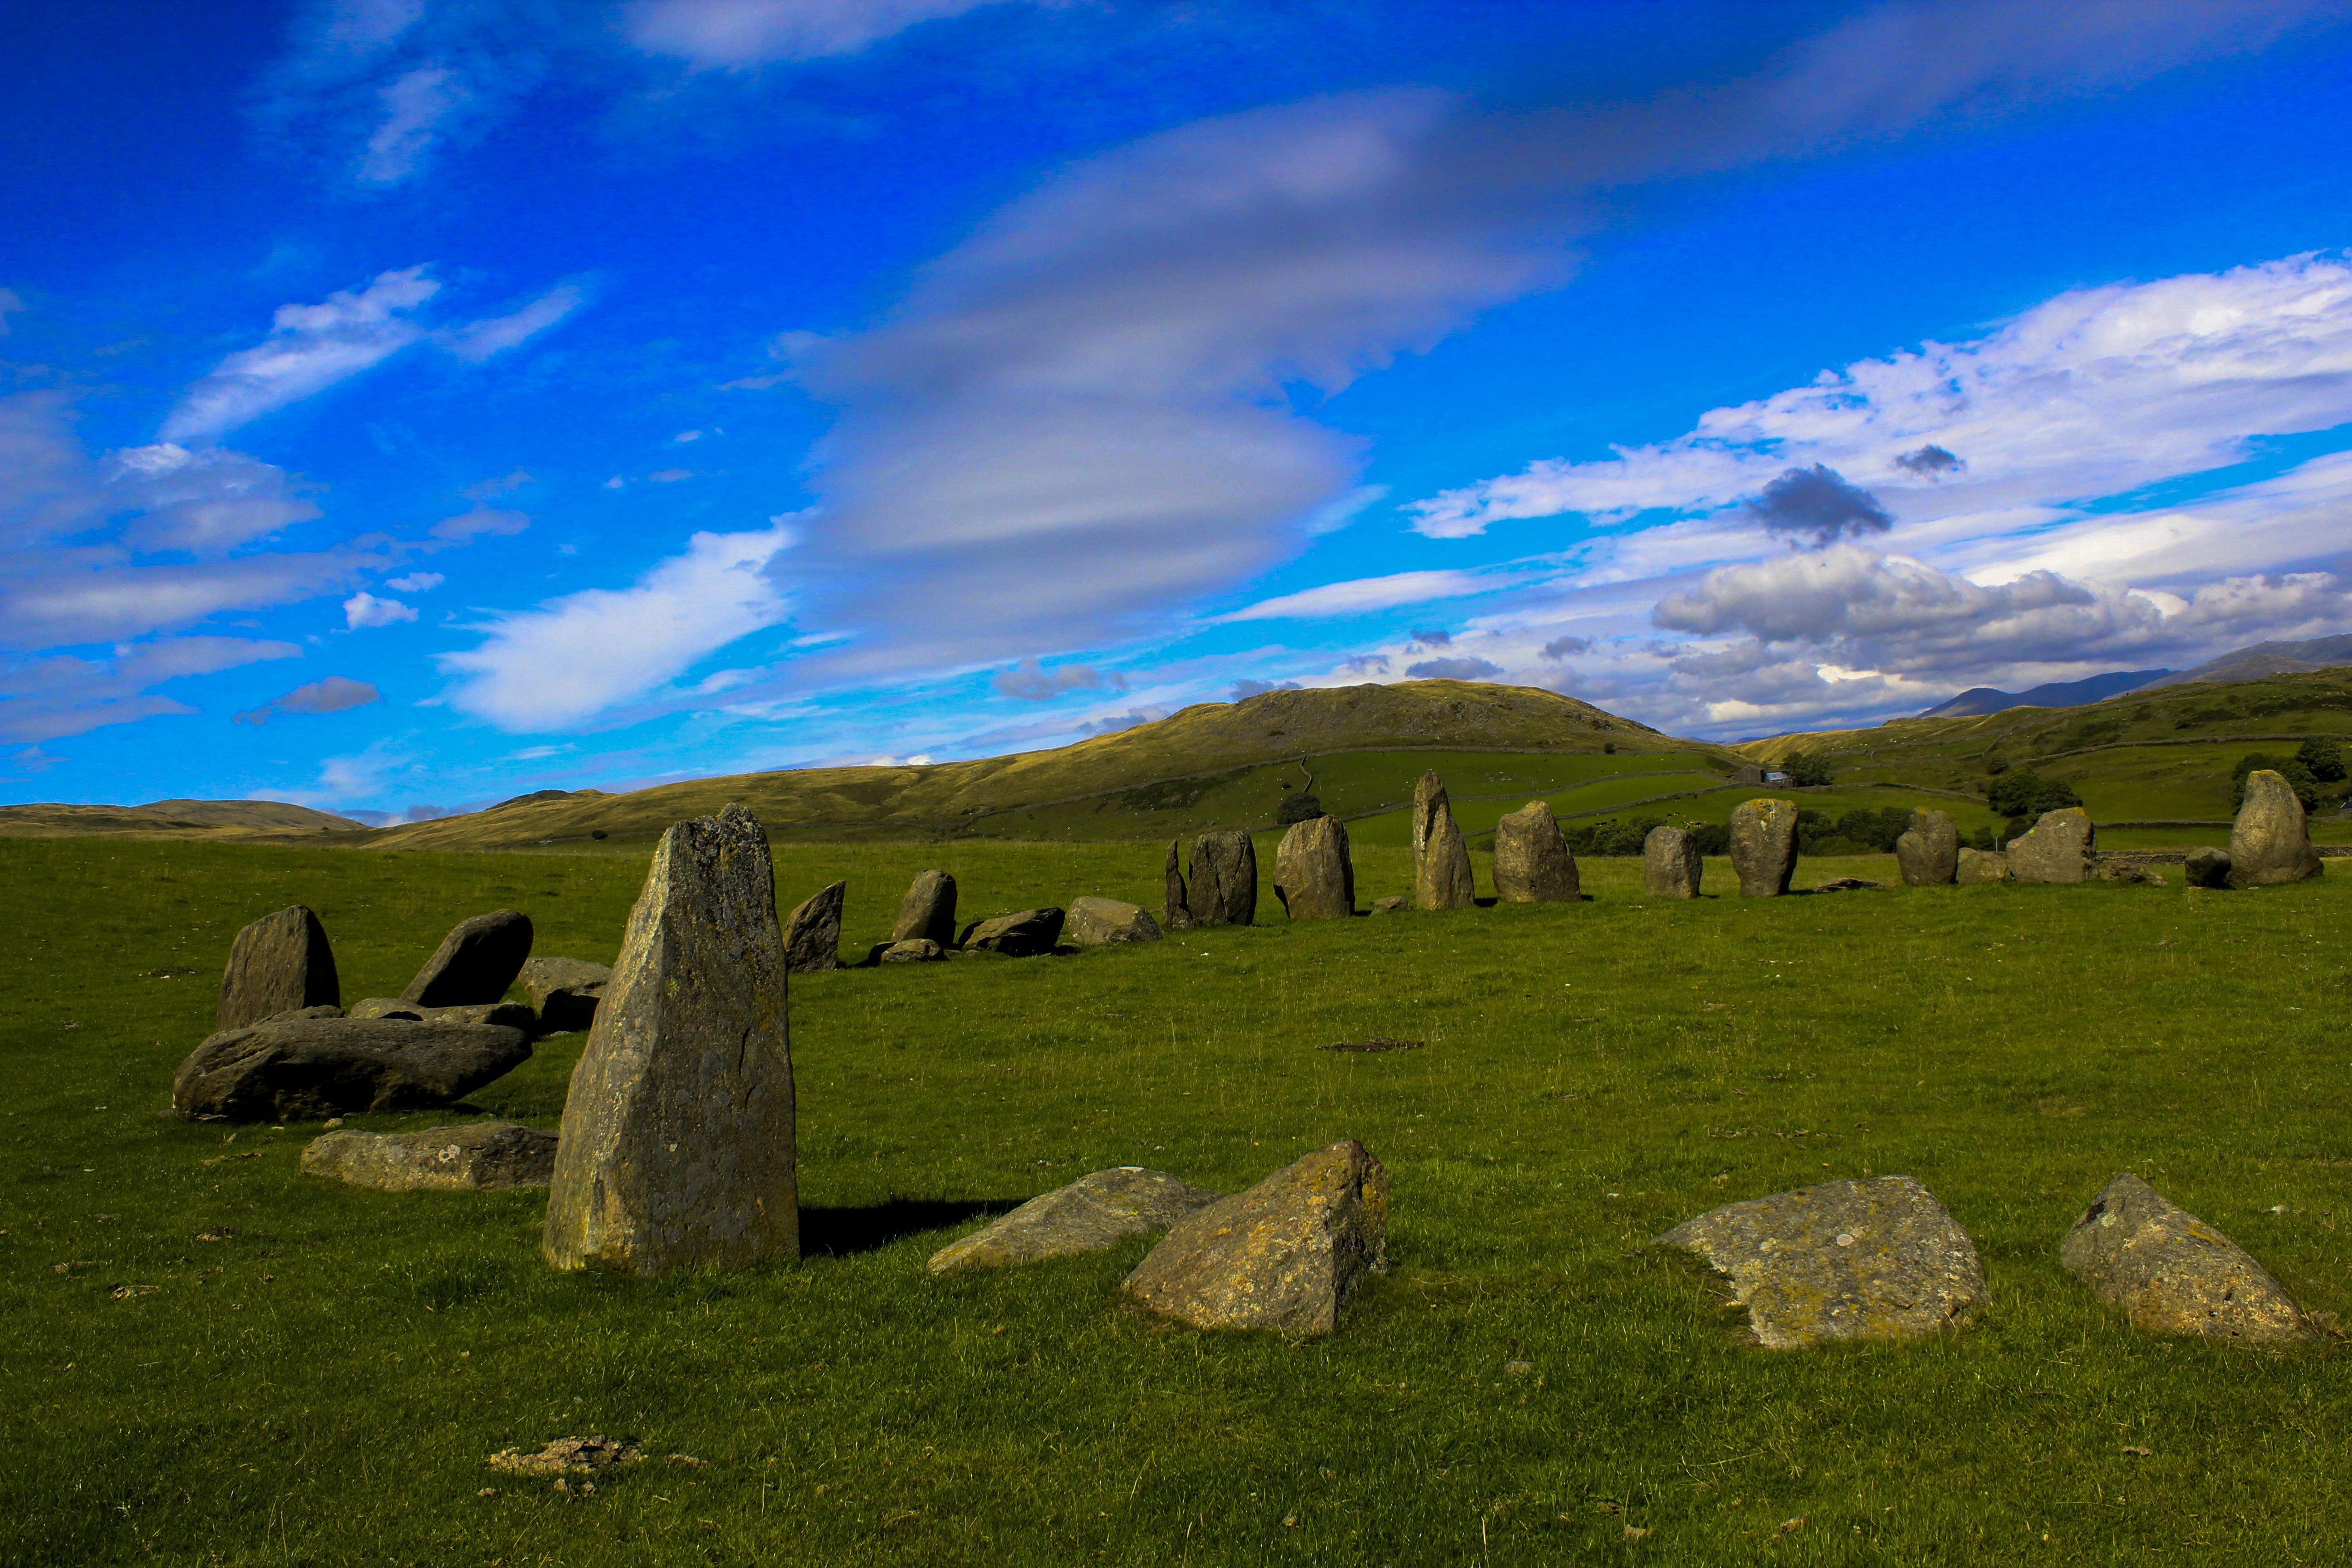 Swinside Stone Circle, Ancient, Animal, Blue, Bridge, HQ Photo